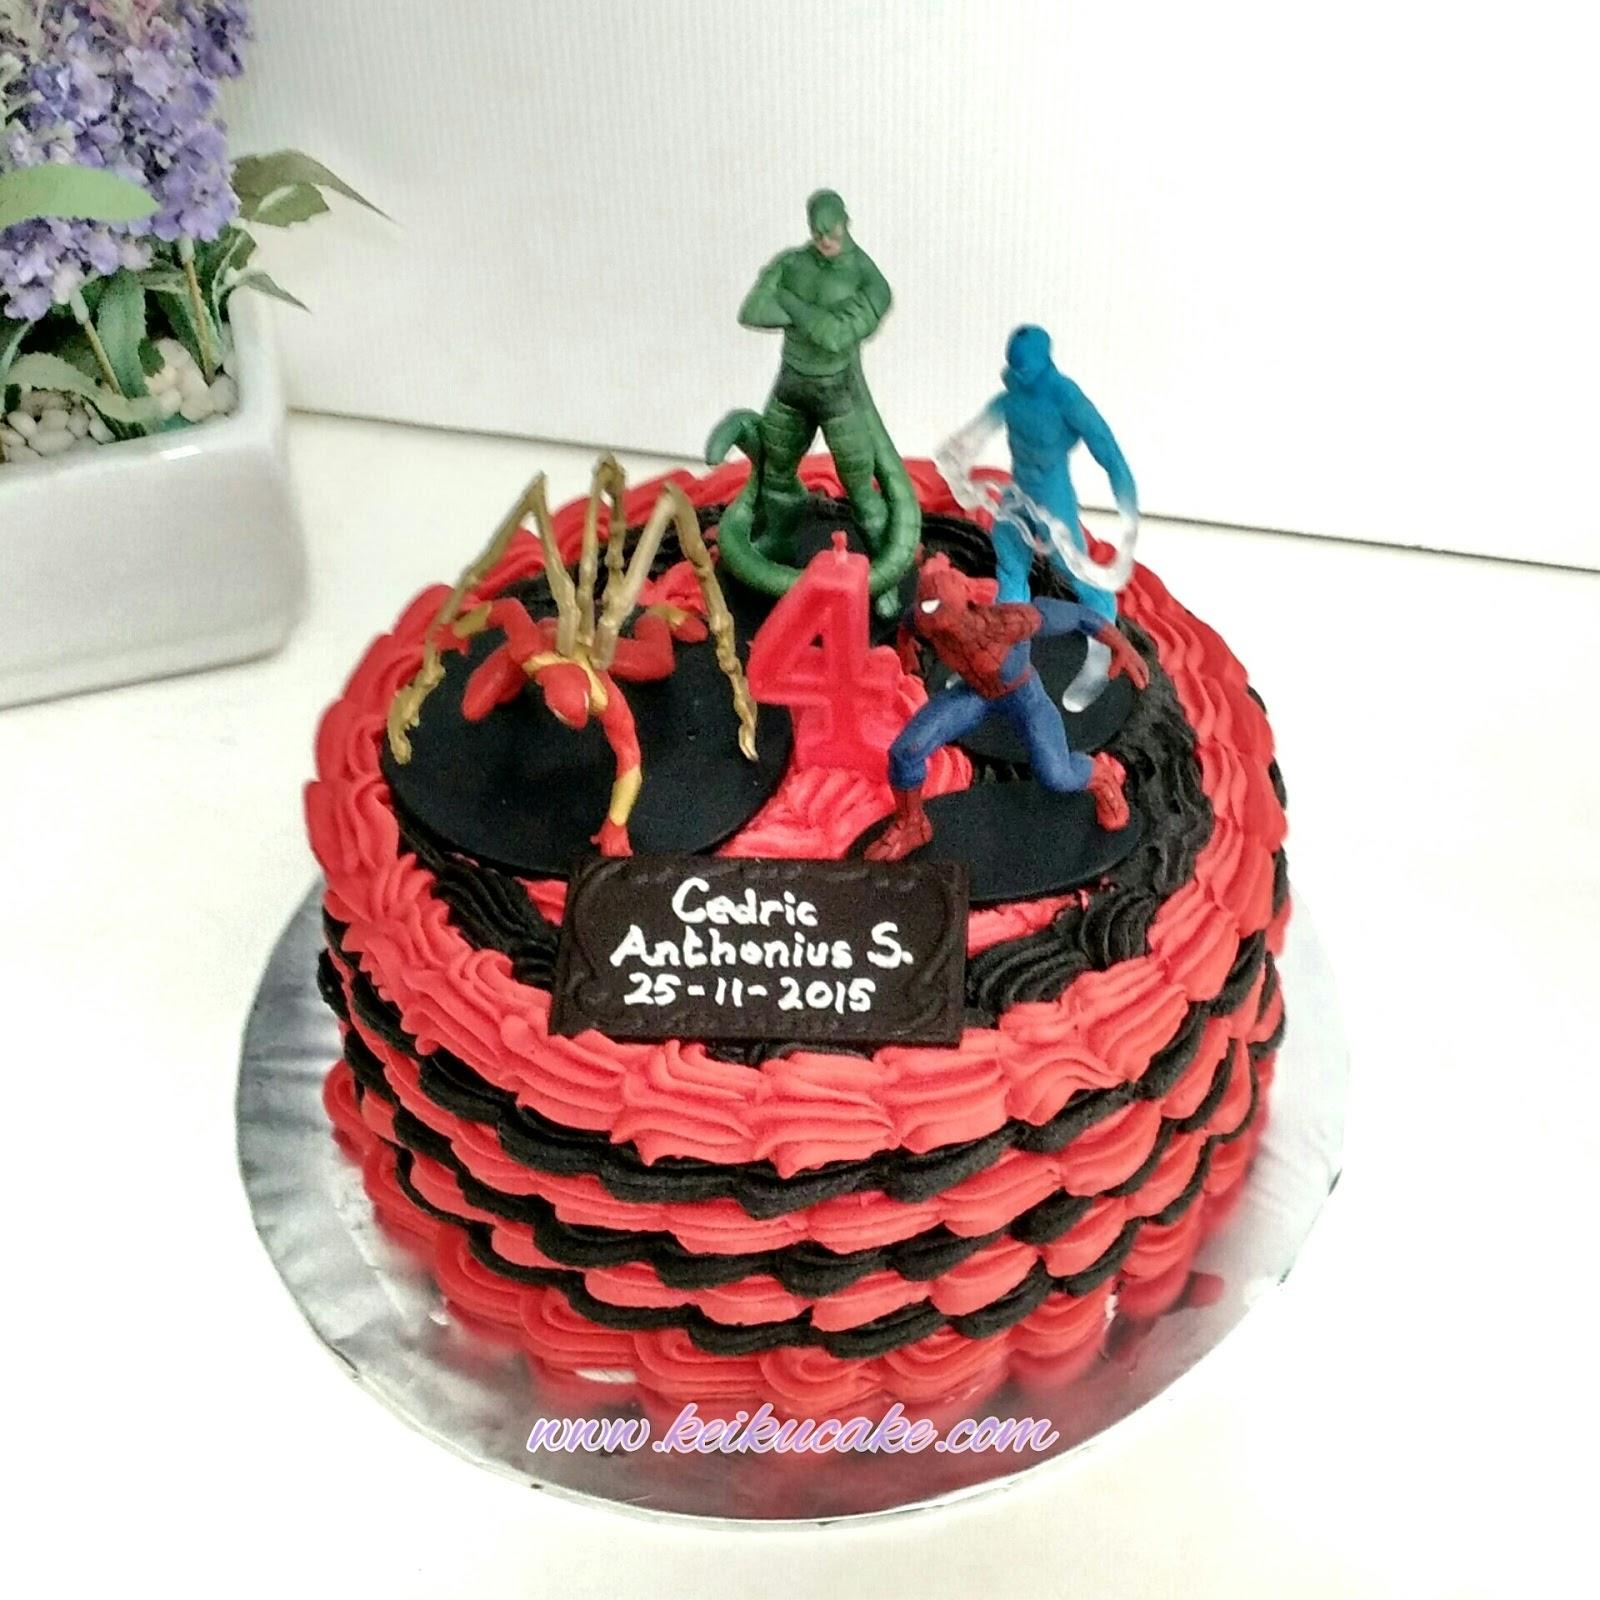 Spiderman Buttercream Cake Design : Keiku Cake: Black and red buttercream spiderman cake